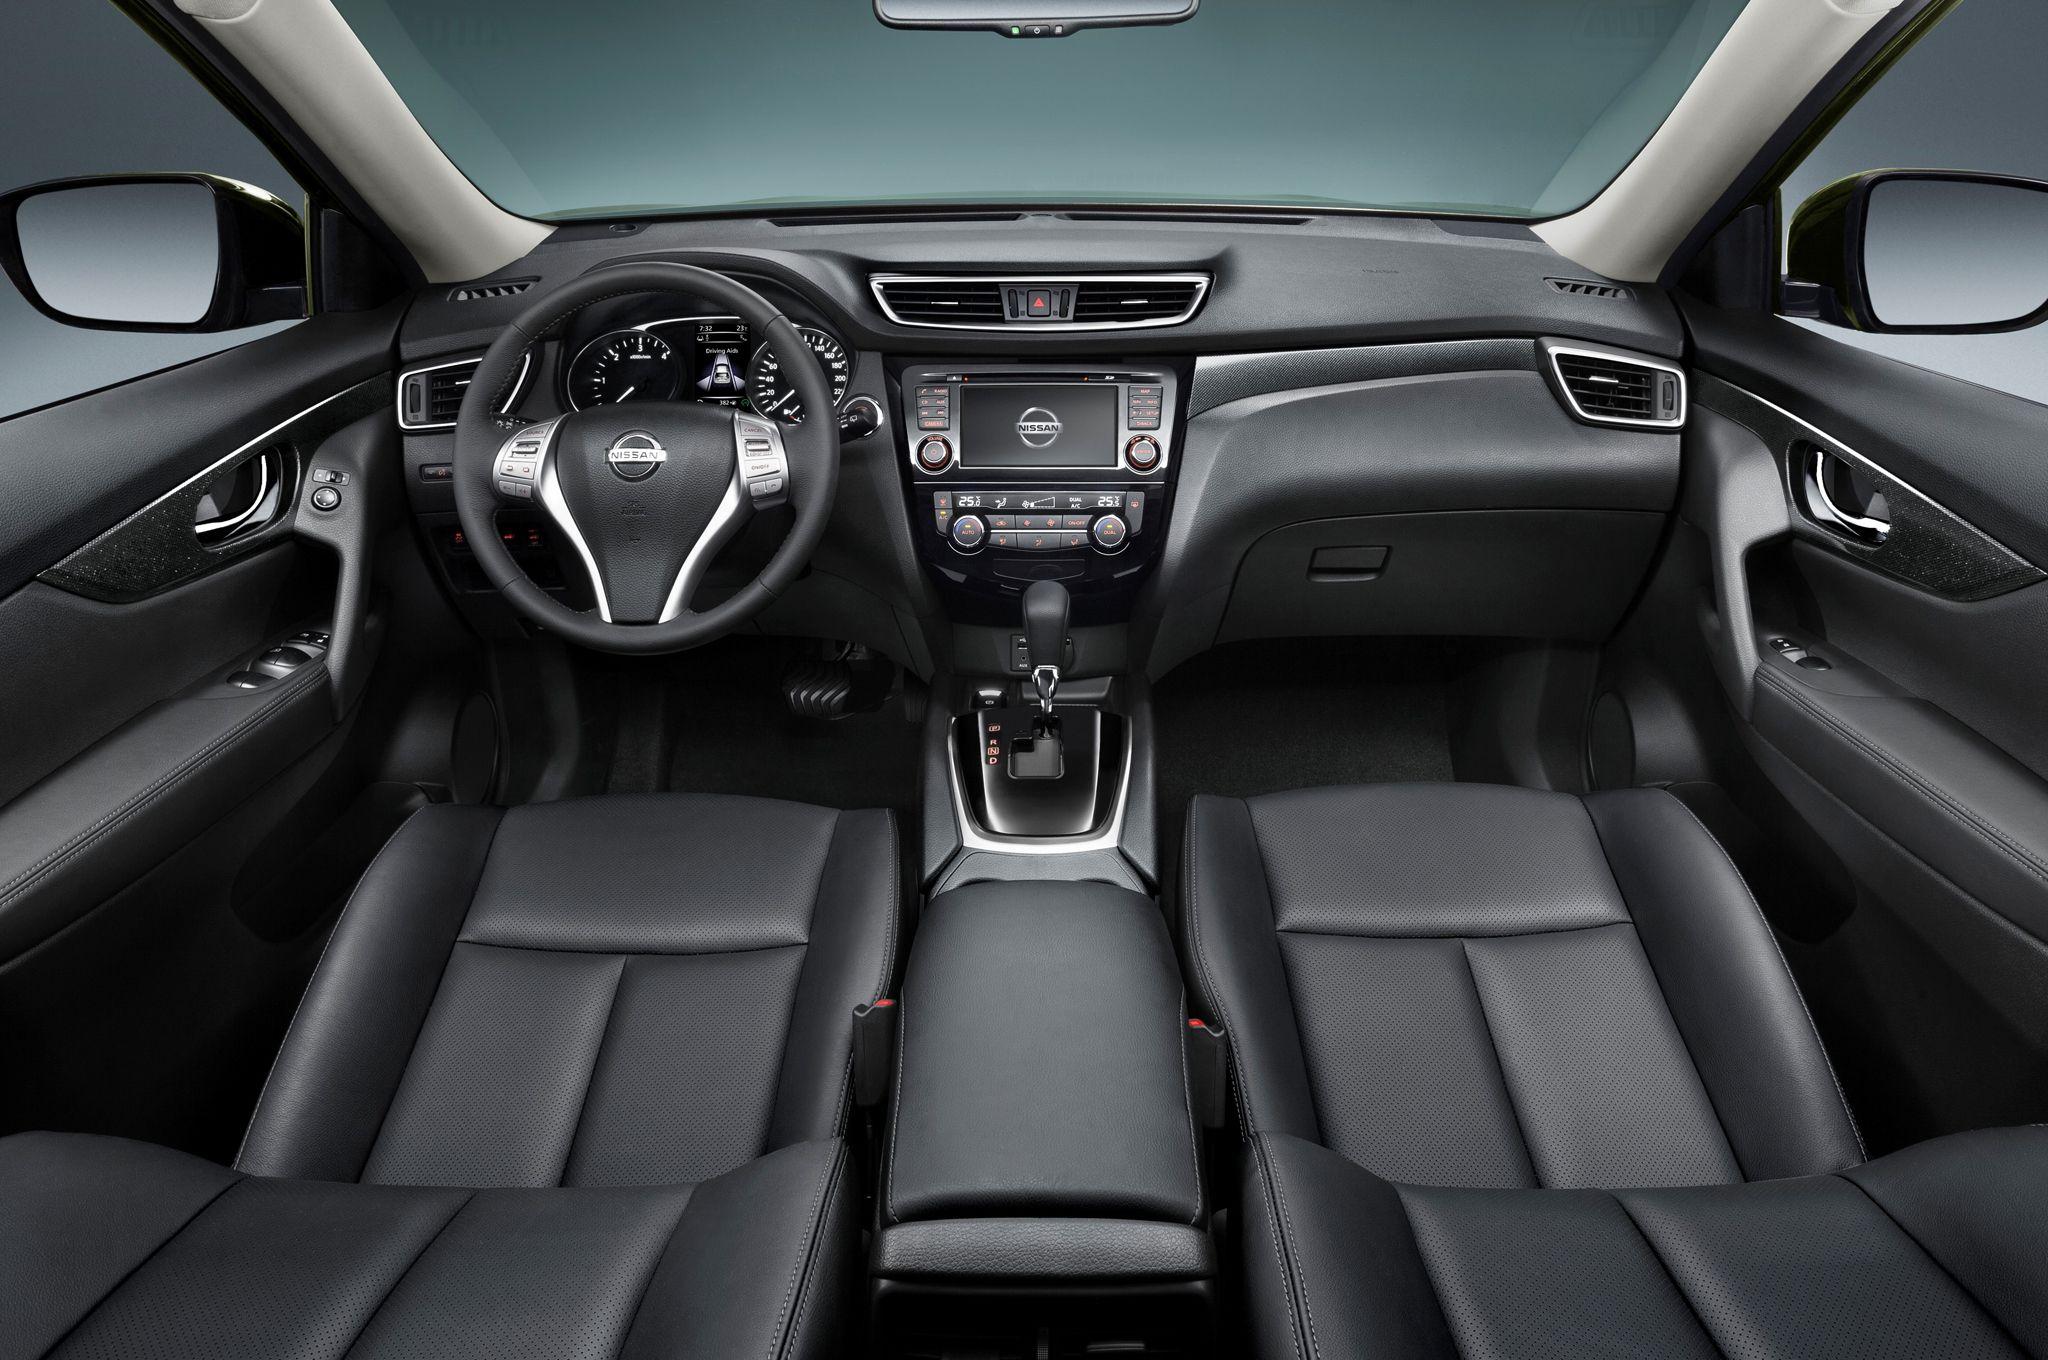 2014 Nissan Rouge Interior Nissan rogue interior, Nissan